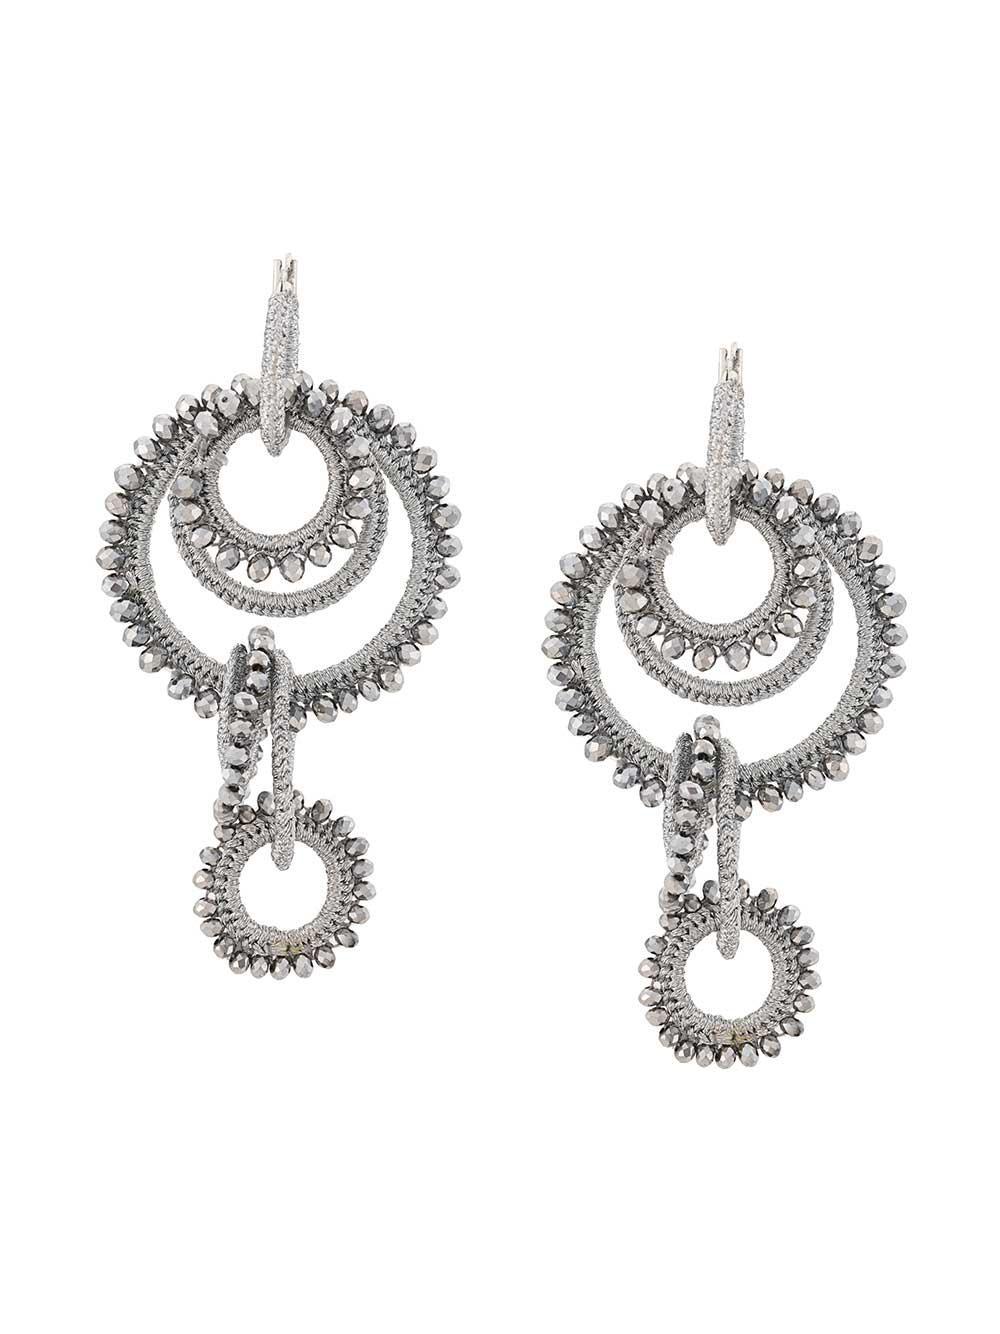 Tallulah Multi Ring Earrings